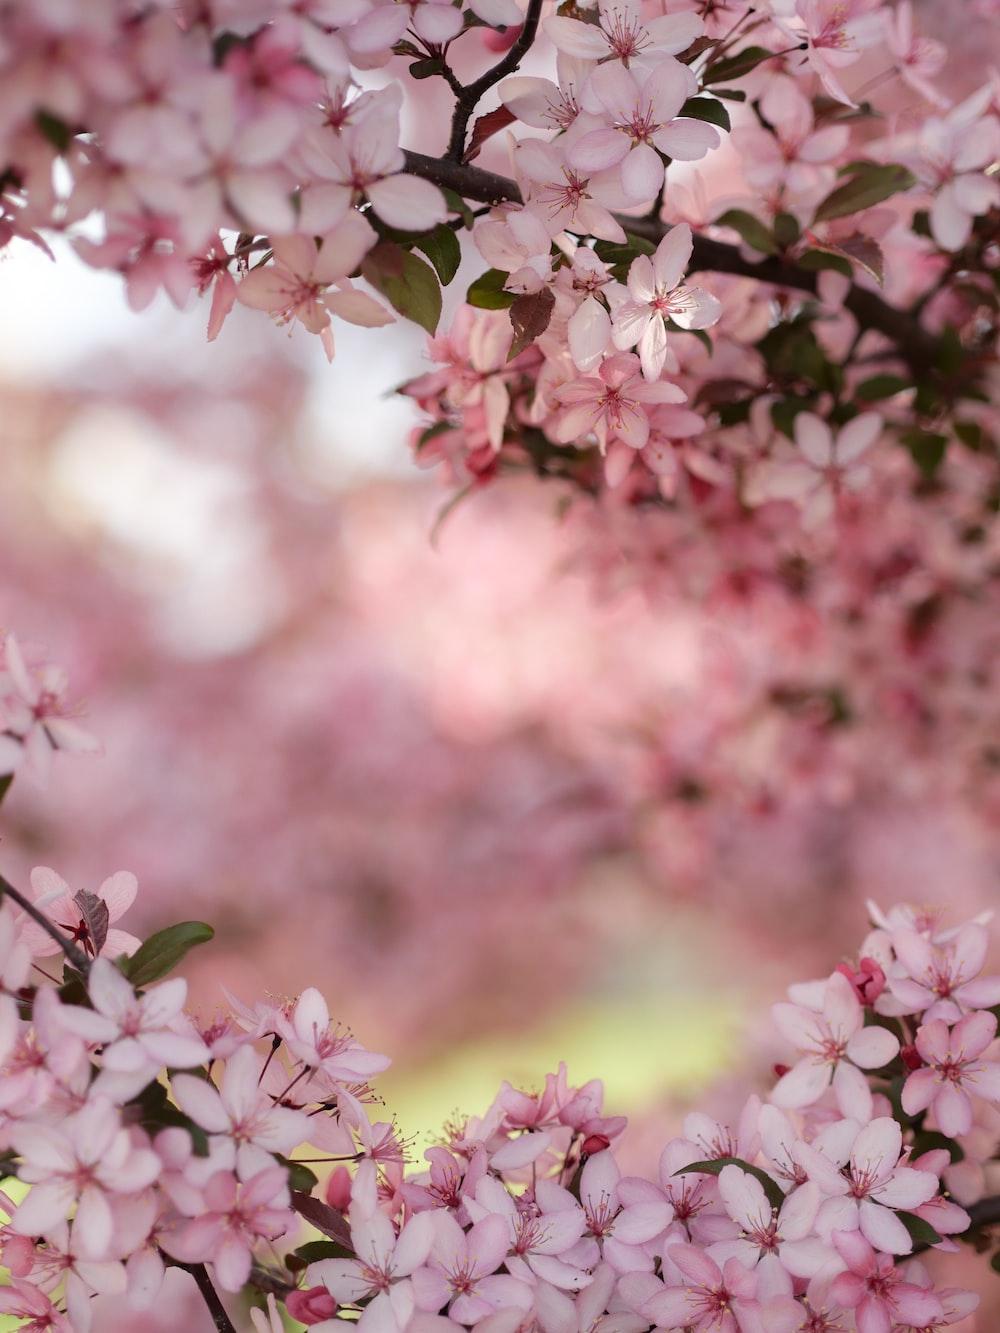 Macro Flower Pink And Stigma Hd Photo By Michael Held